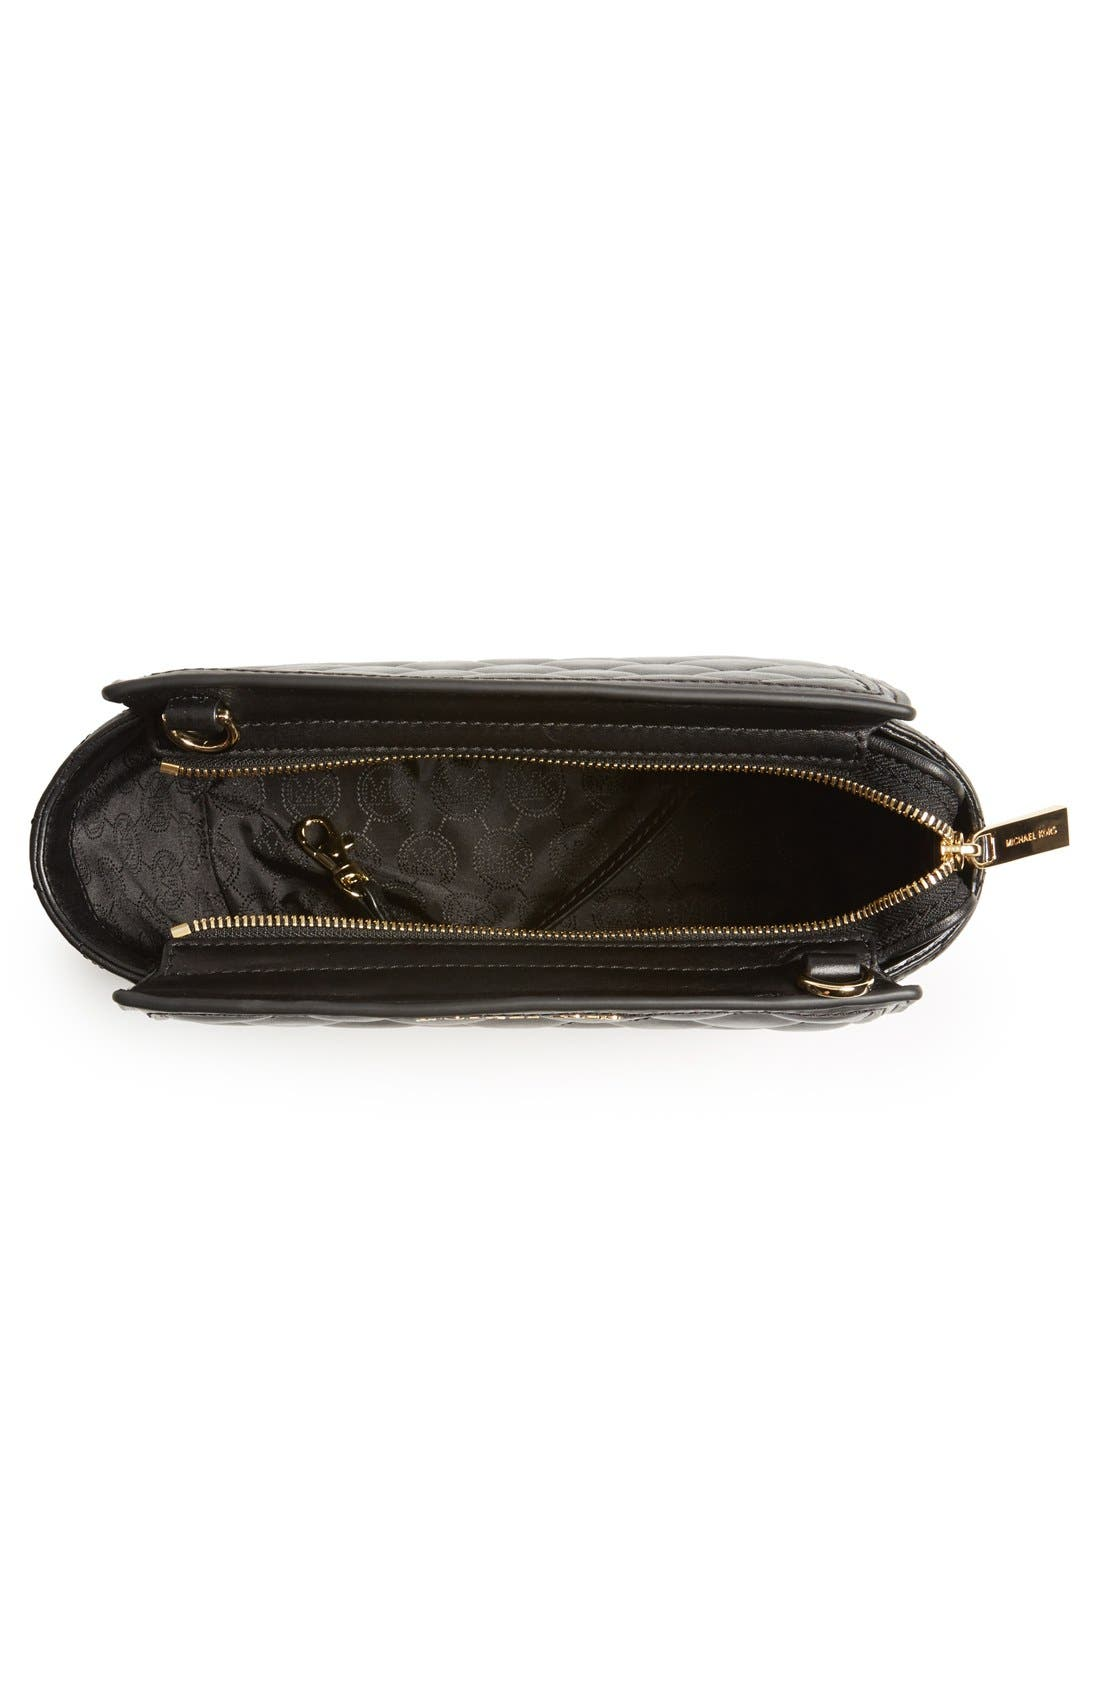 Alternate Image 2  - MICHAEL Michael Kors 'Medium Selma' Quilted Leather Messenger Bag